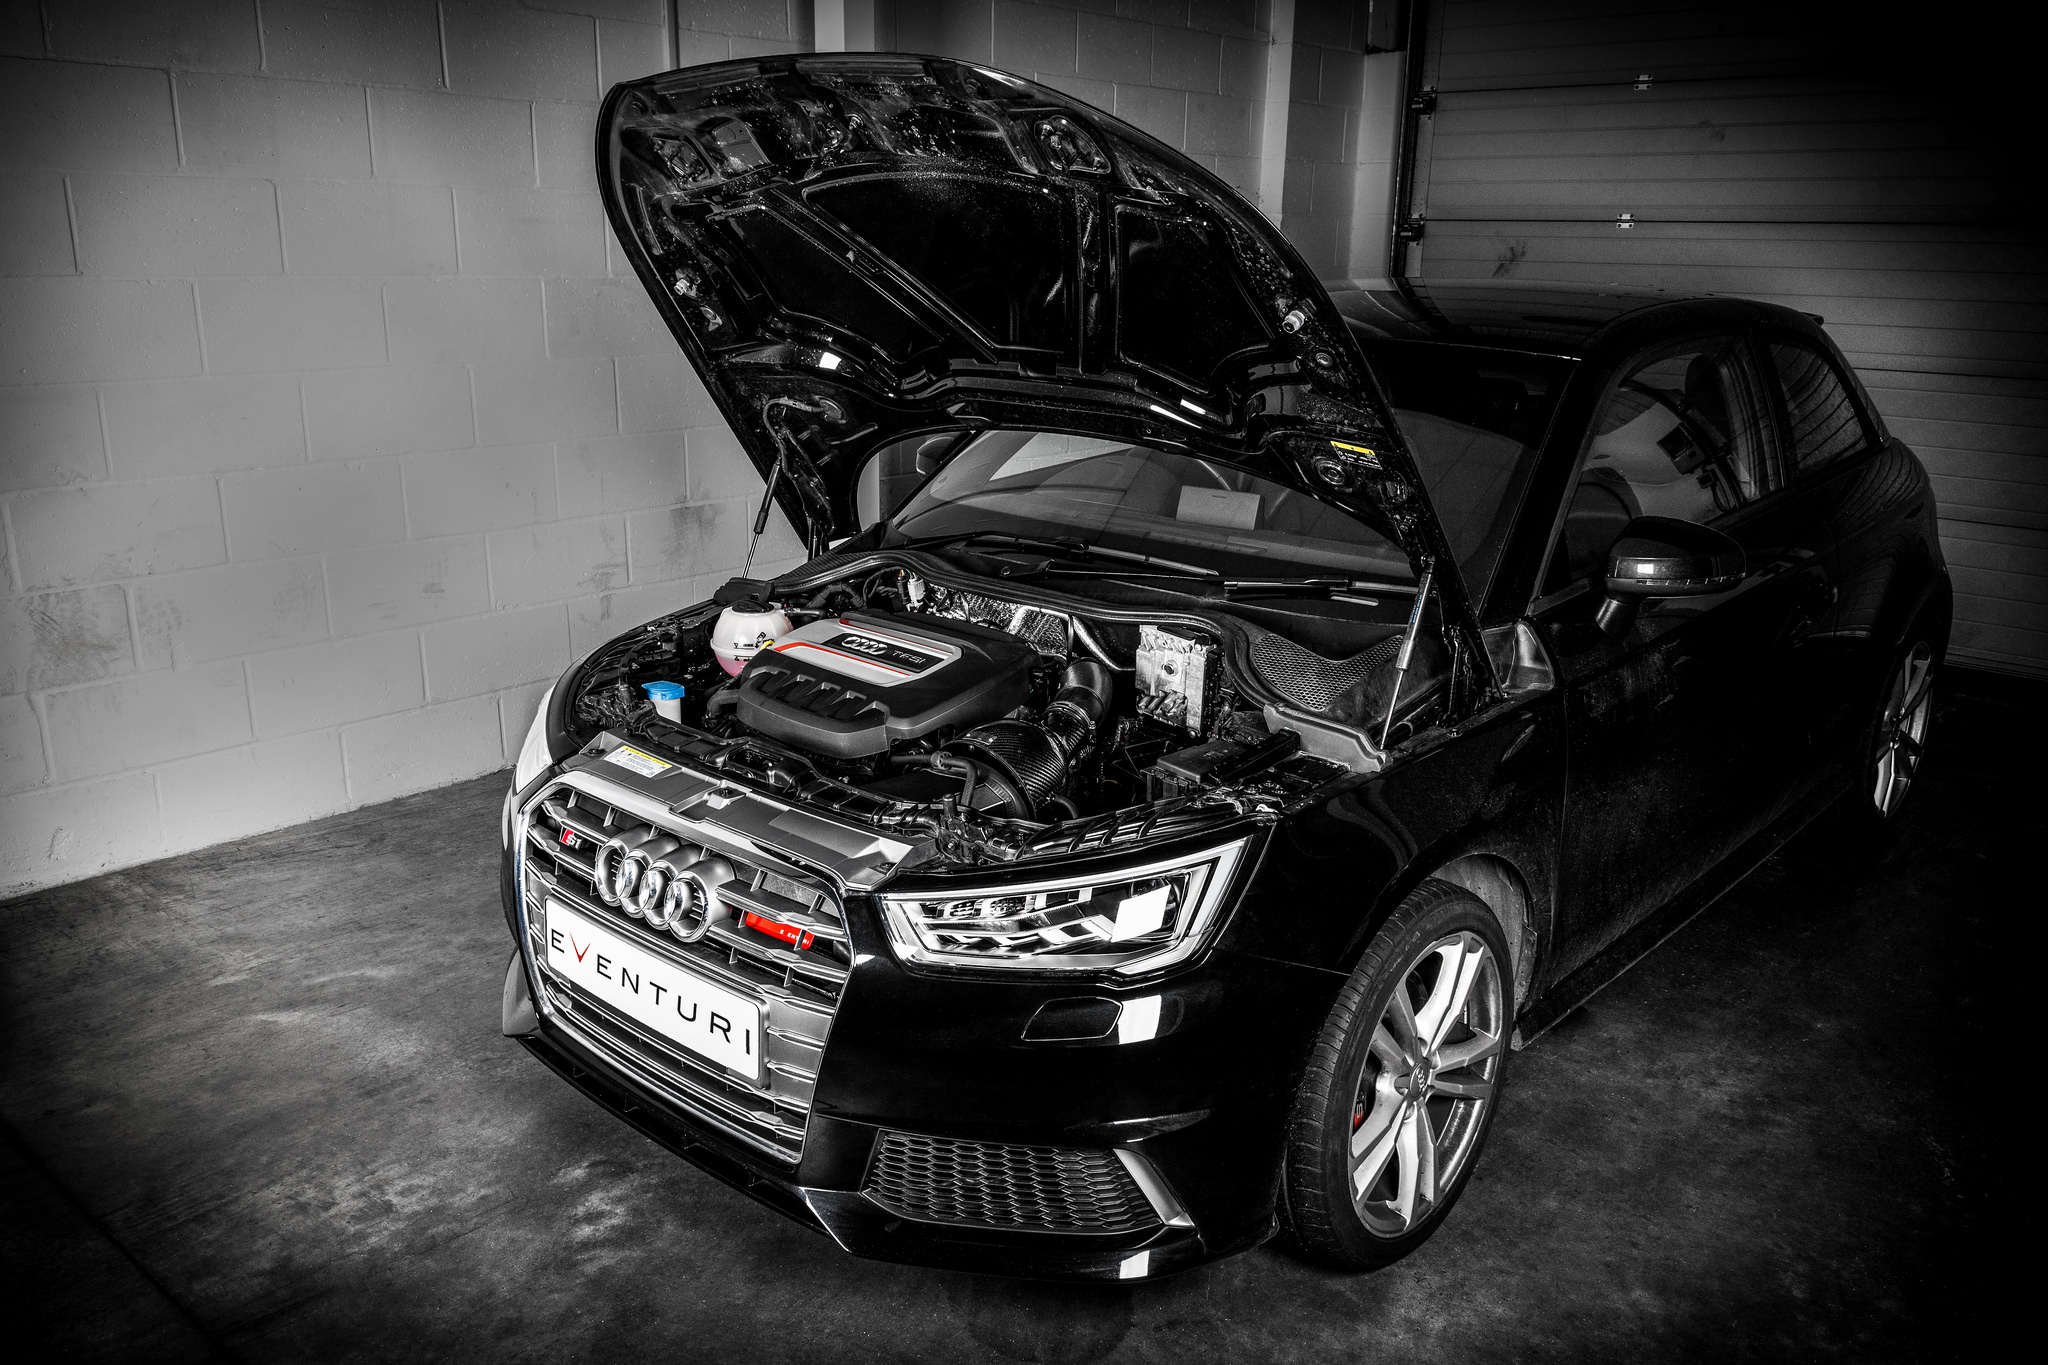 Audi-S1-Eventuri-intake-7